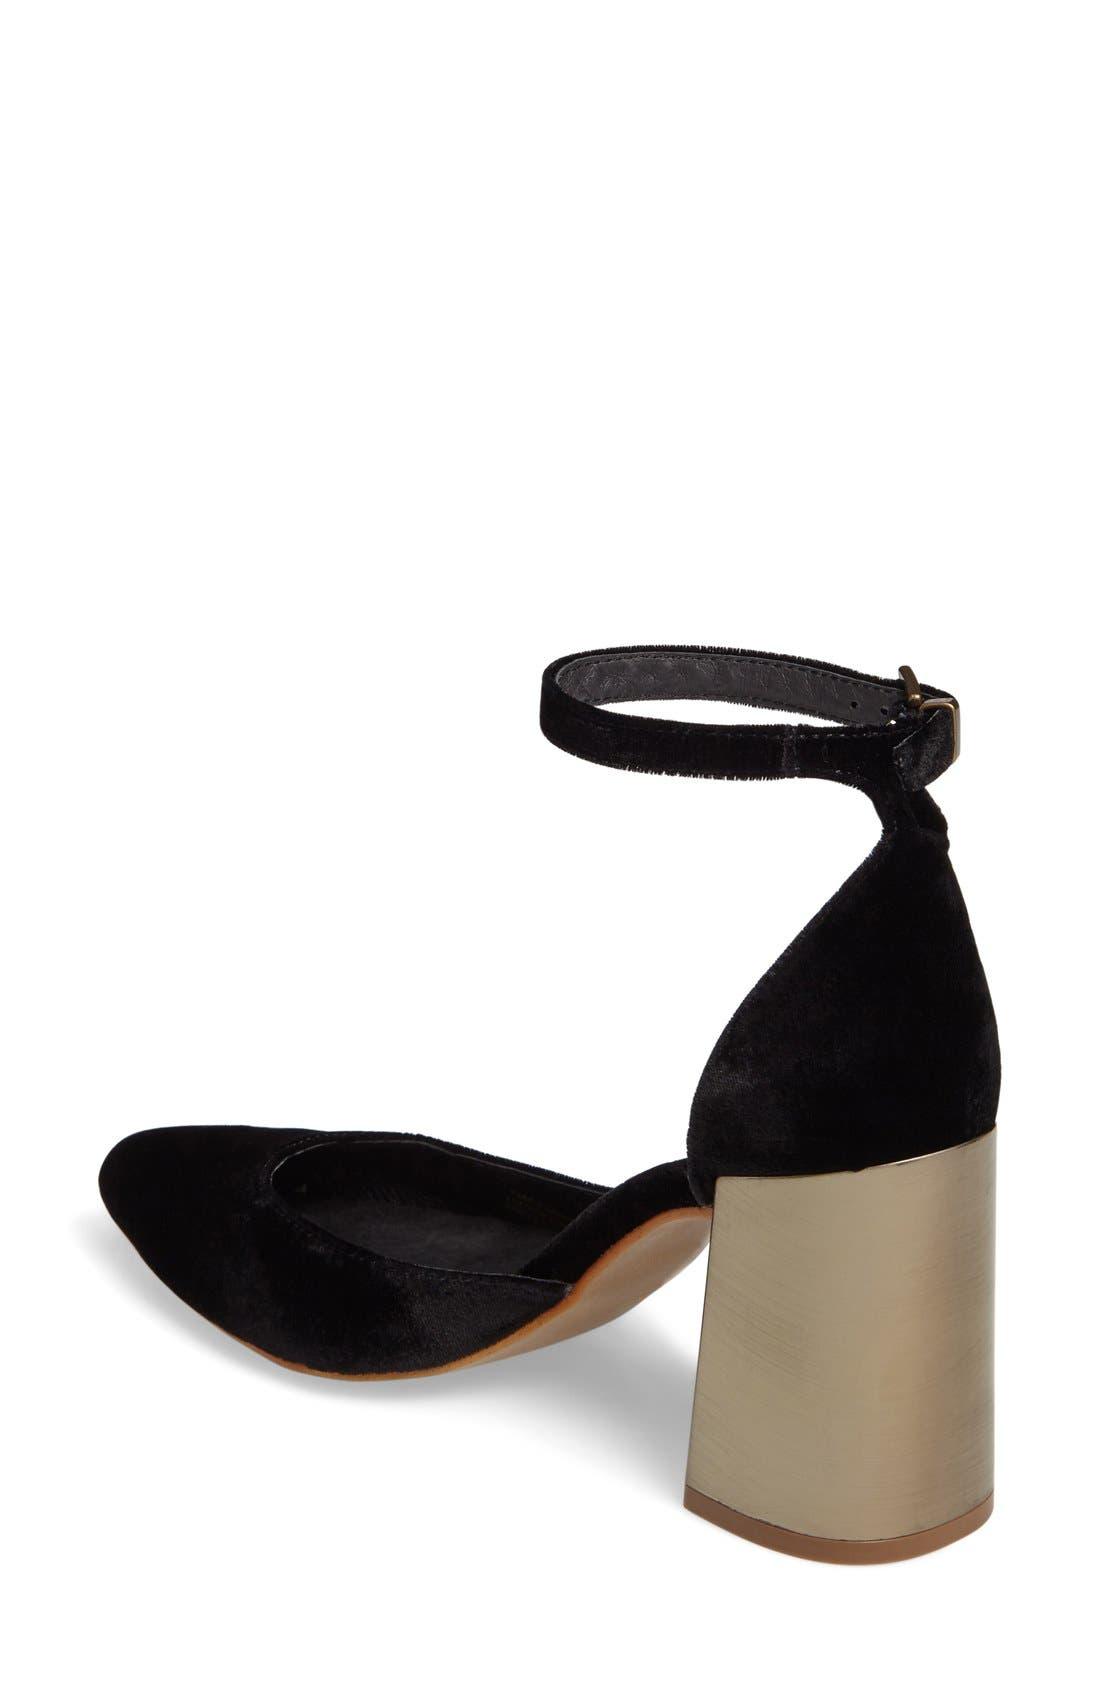 Alternate Image 2  - Shellys London Torrance Block Heel Pump (Women)